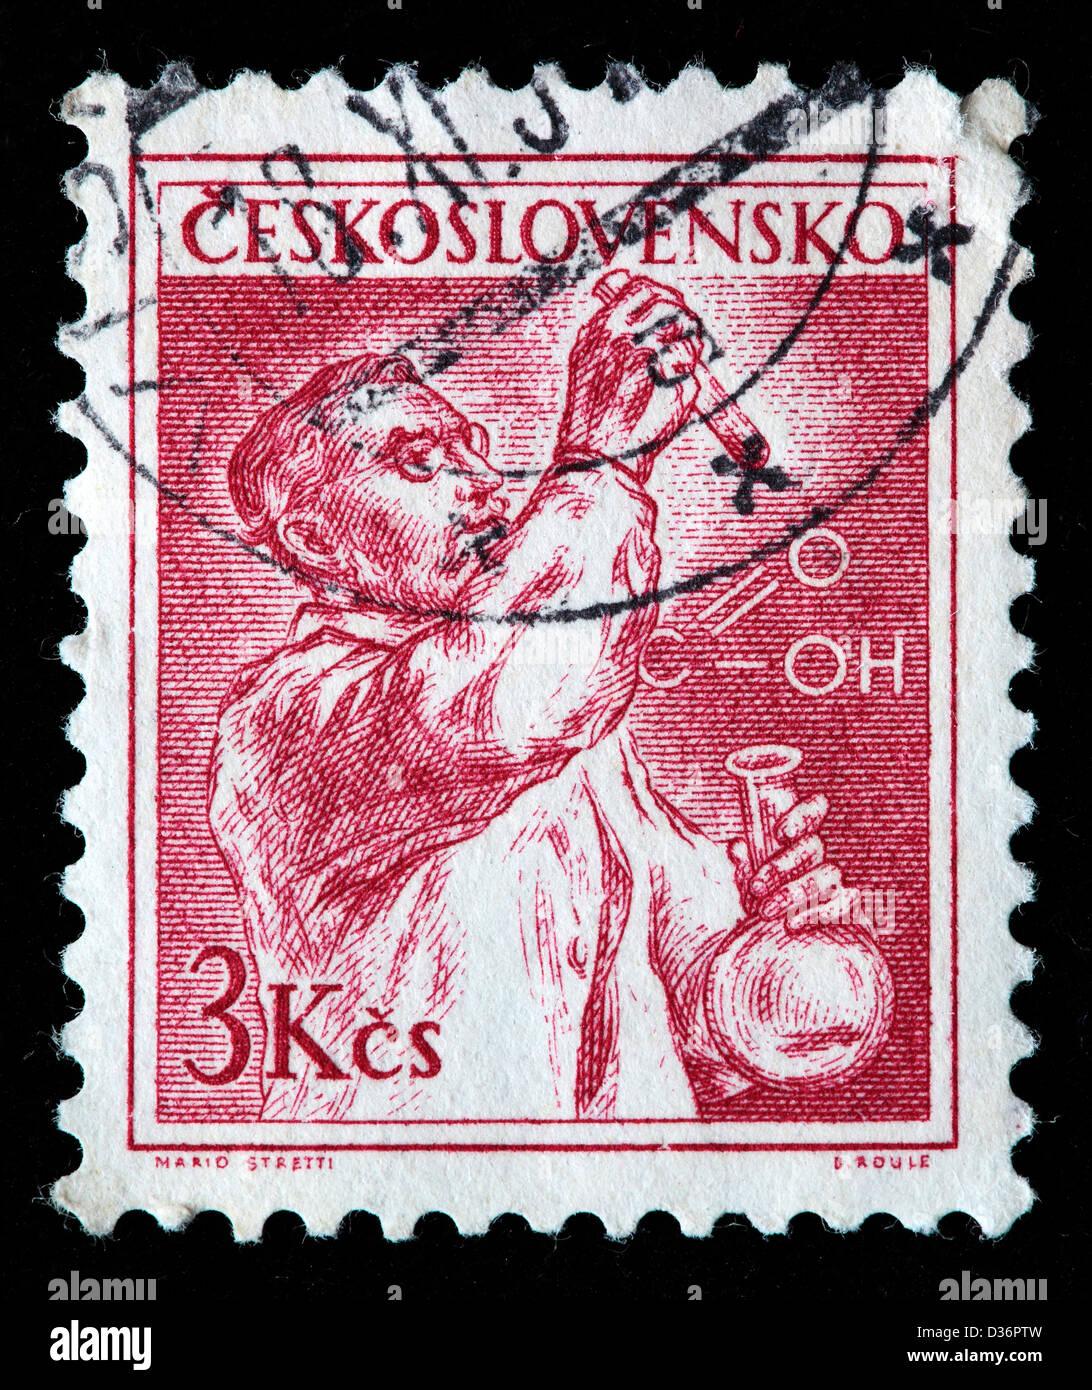 Chemist, postage stamp, Czechoslovakia, 1954 - Stock Image